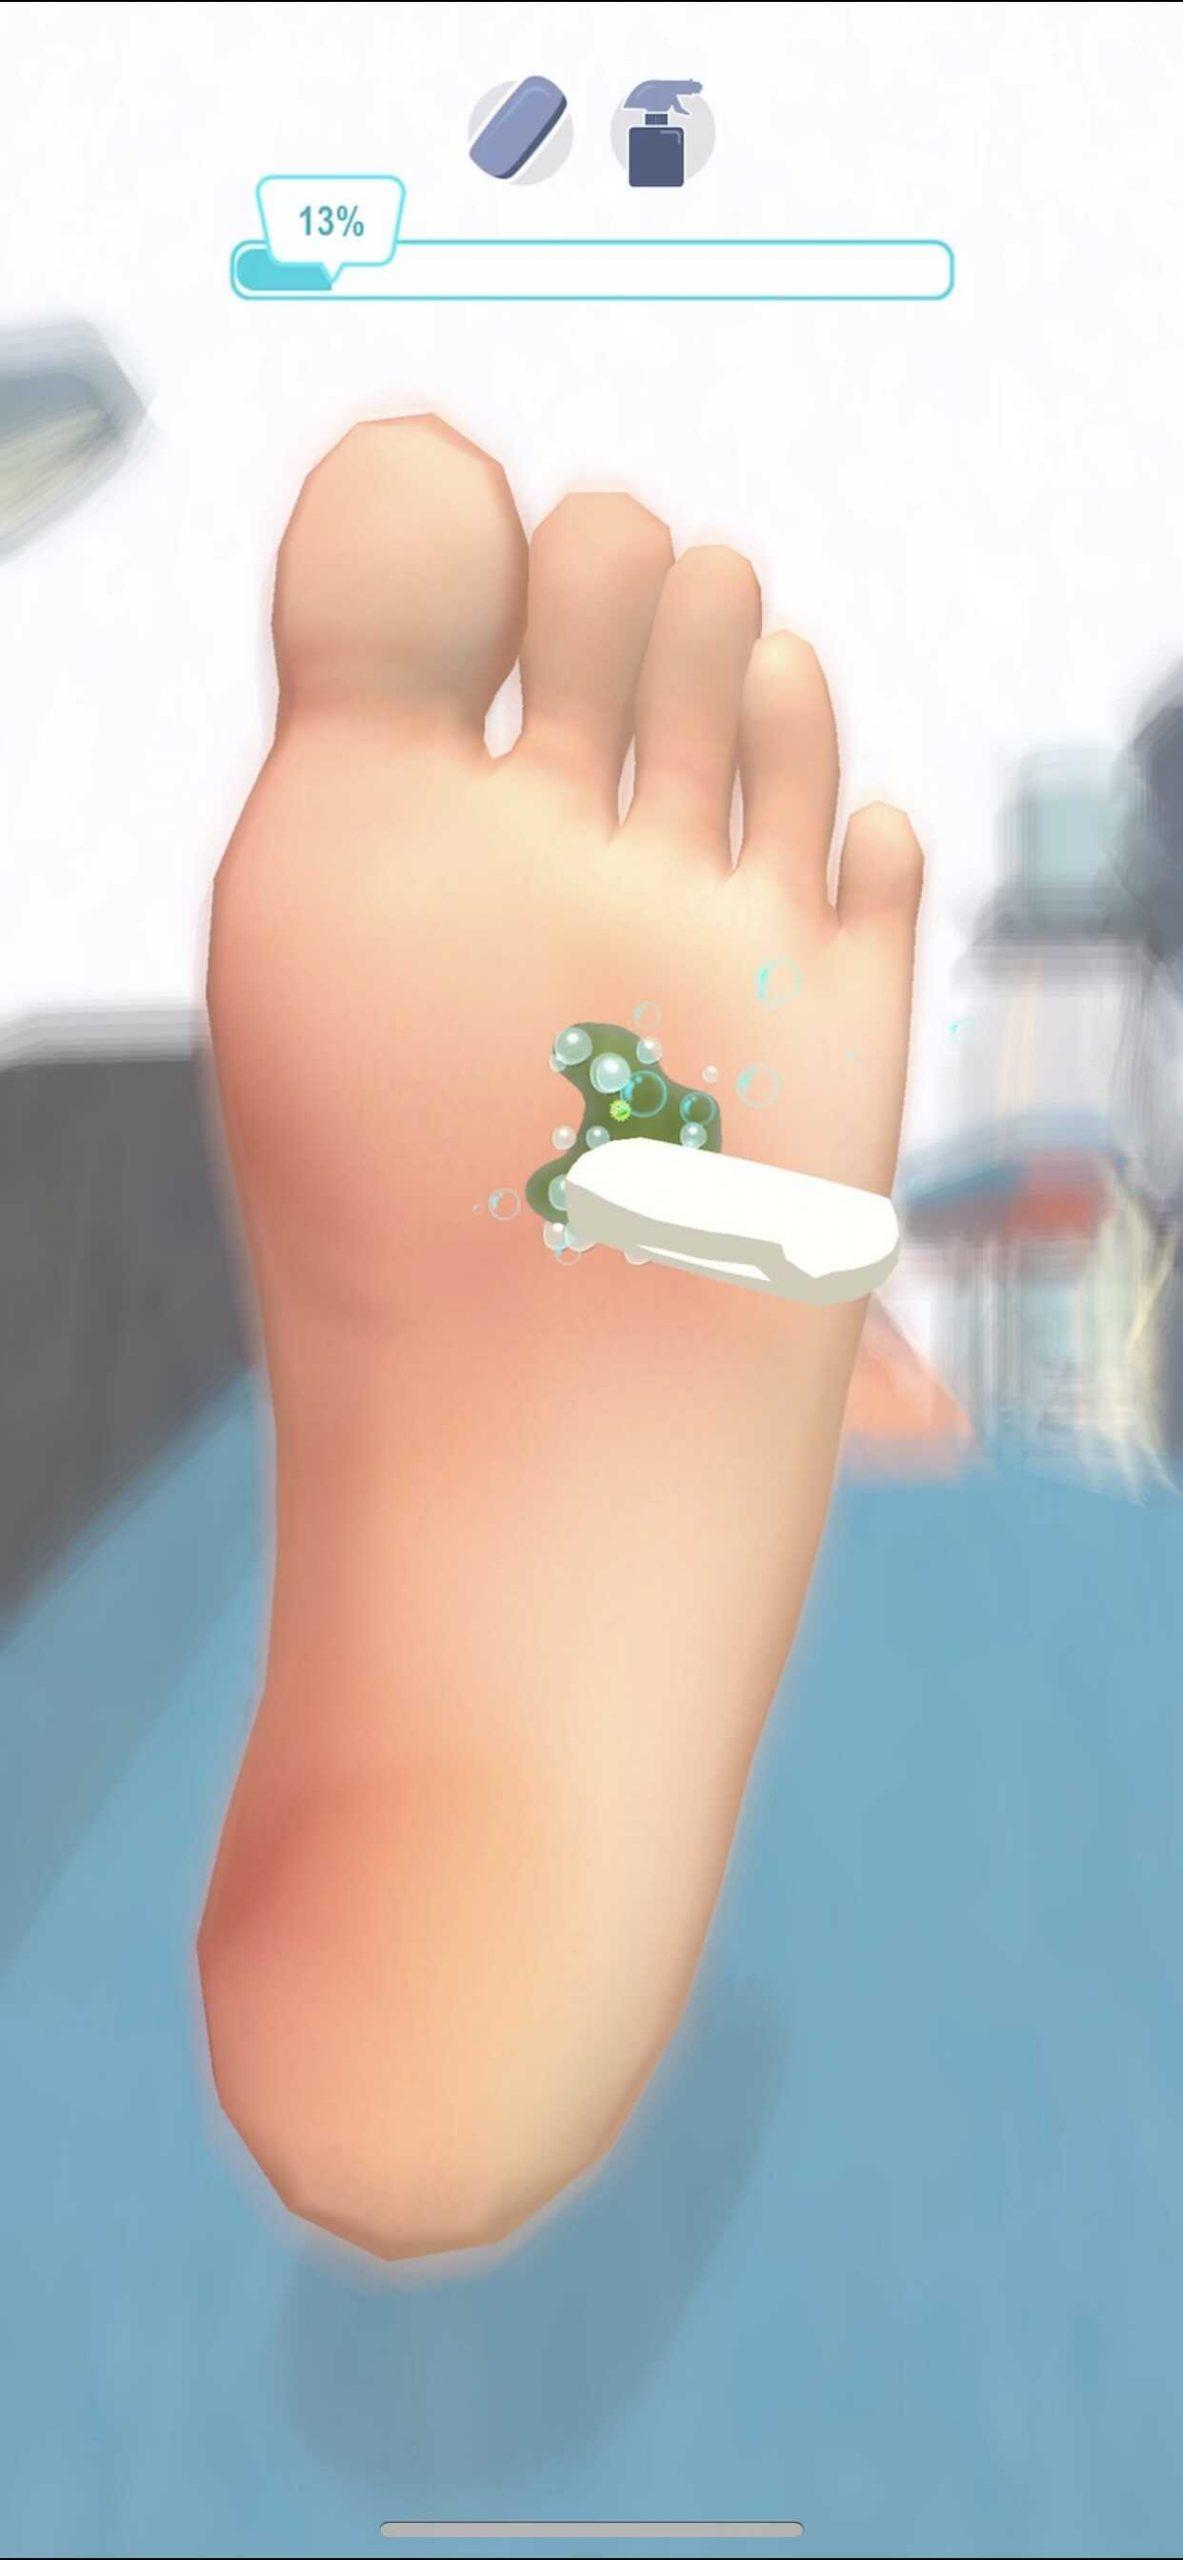 Foot Clinic(フットクリニック)のレビュー